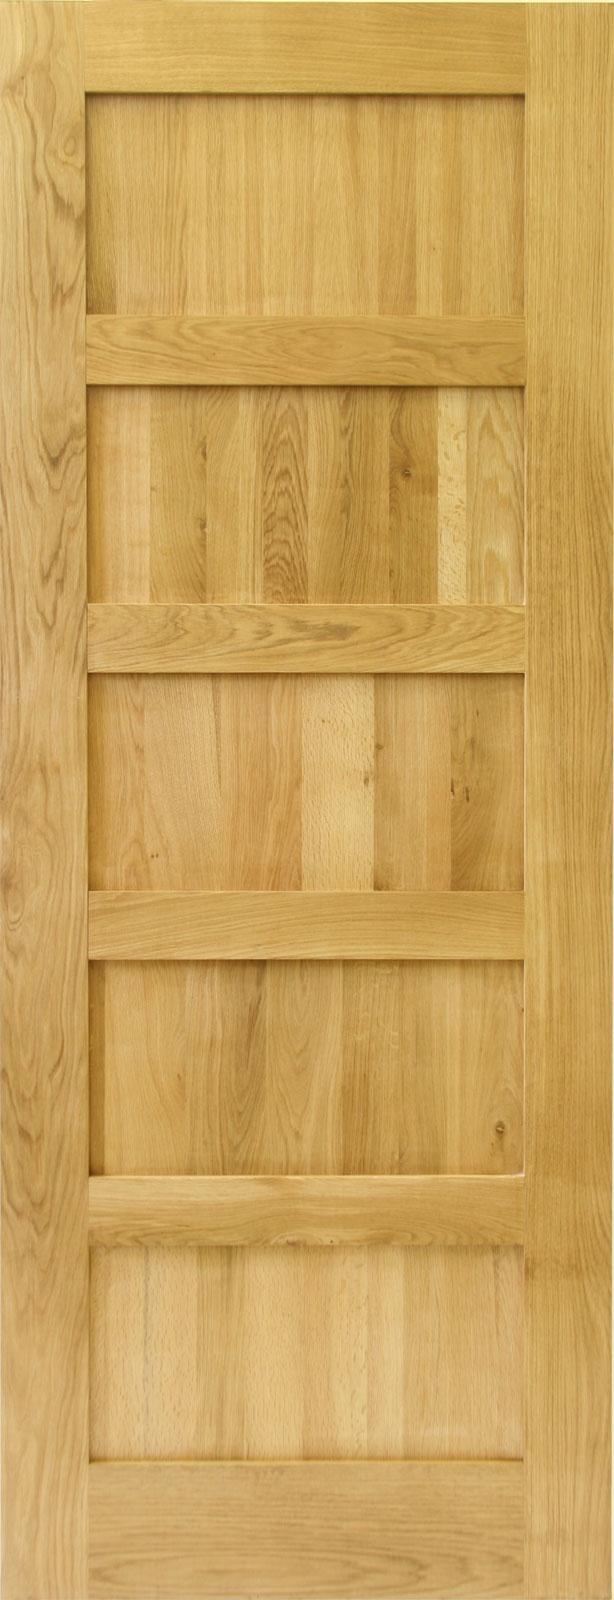 Oak Internal Door Supplier  5-panel shaker style